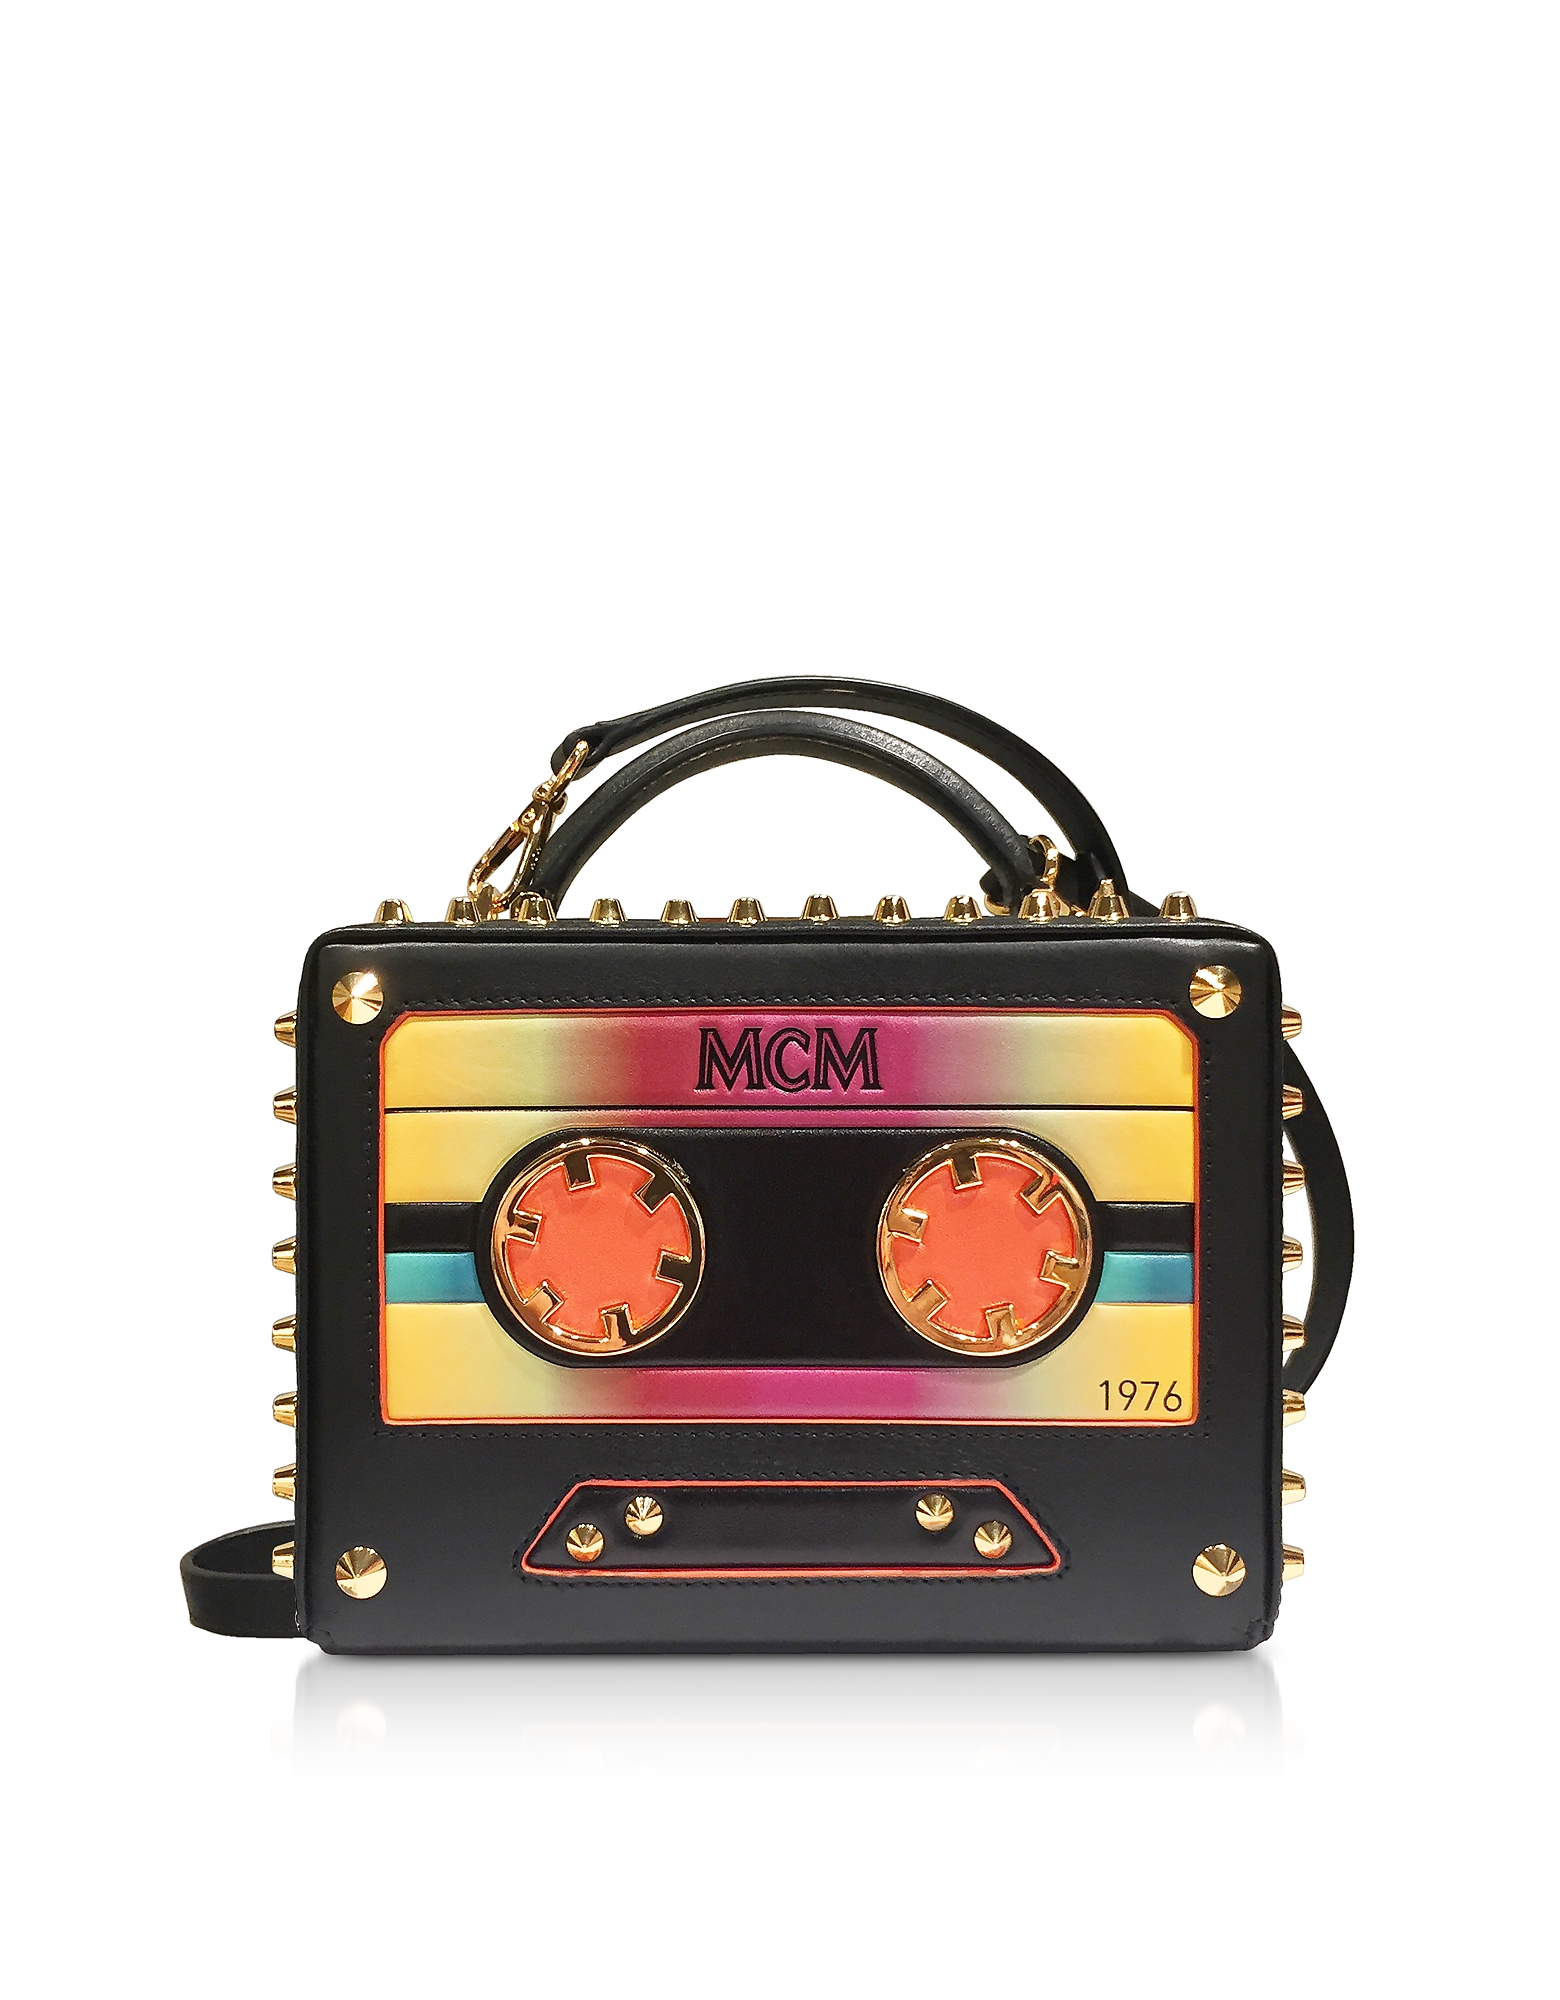 Berlin Cassette Clutch in Pelle con Tracolla